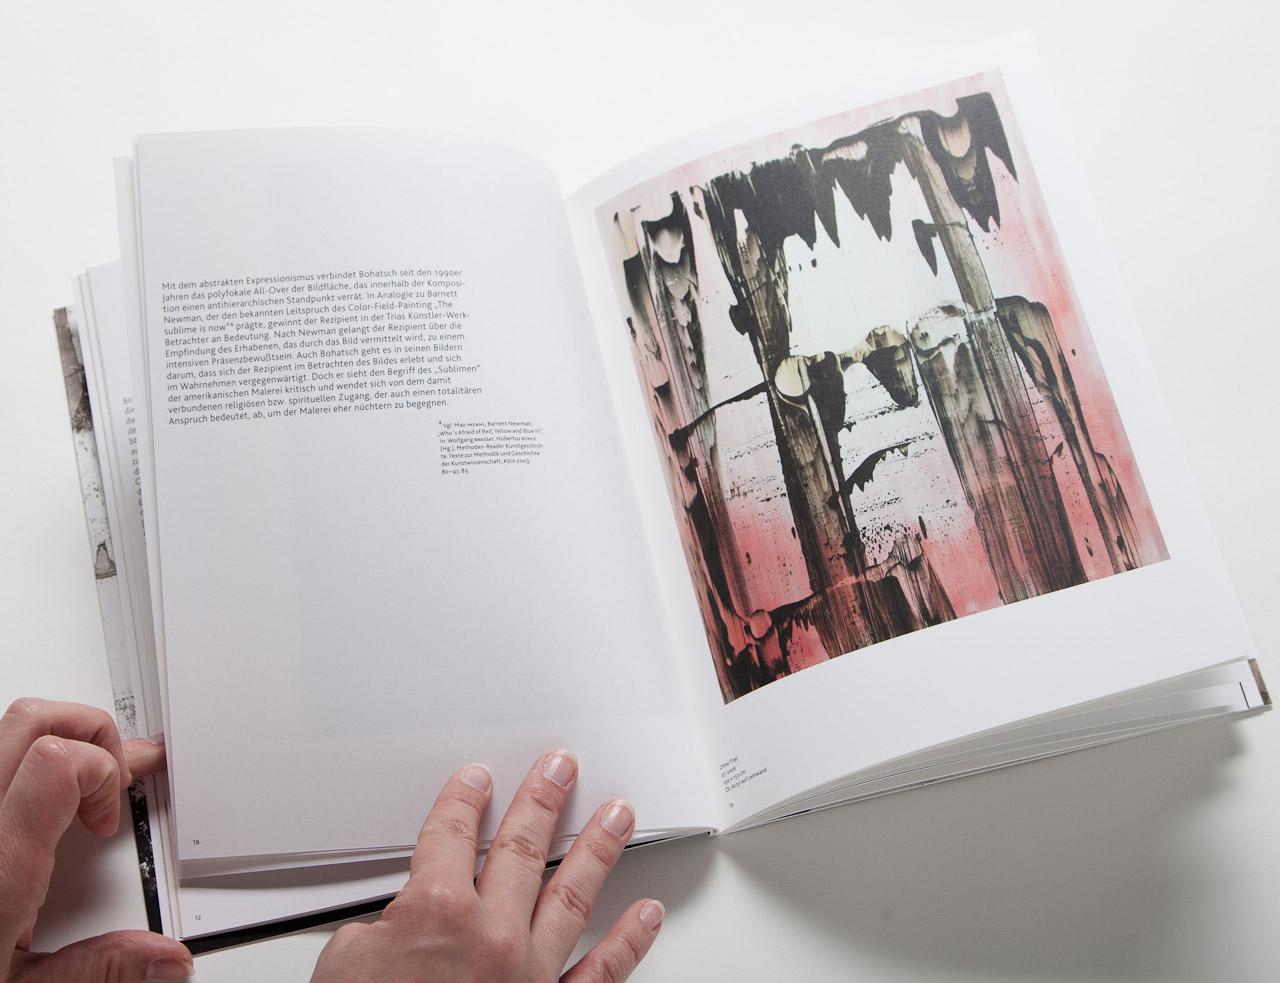 Erwin_Bohatsch_Katalog-8859